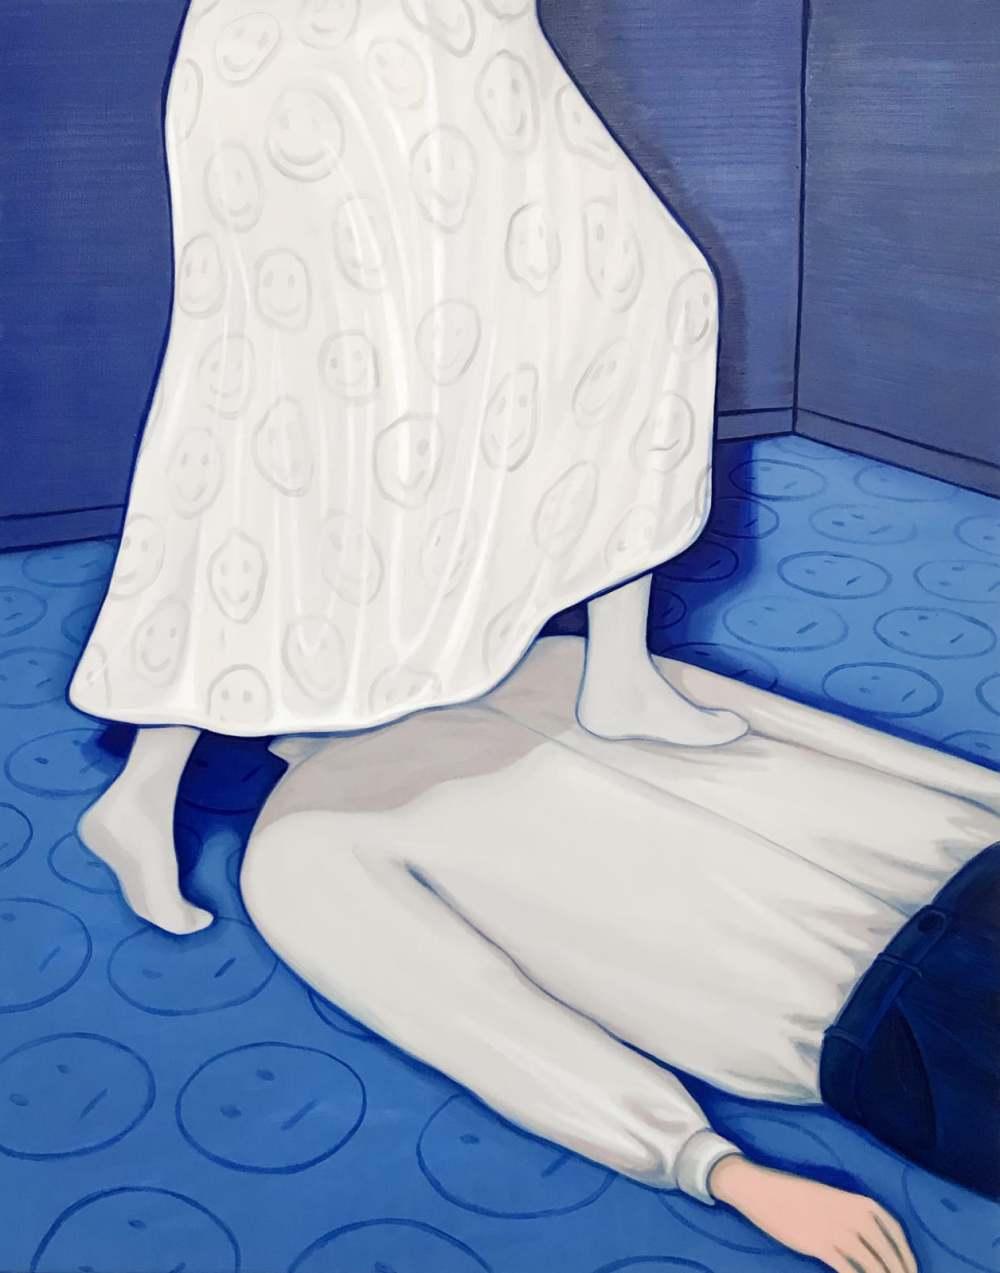 Relationship, oil on canvas, 140x110cm, 2019 Lise Stoufflet   Alba Herrero   Mujeres Mirando Mujeres